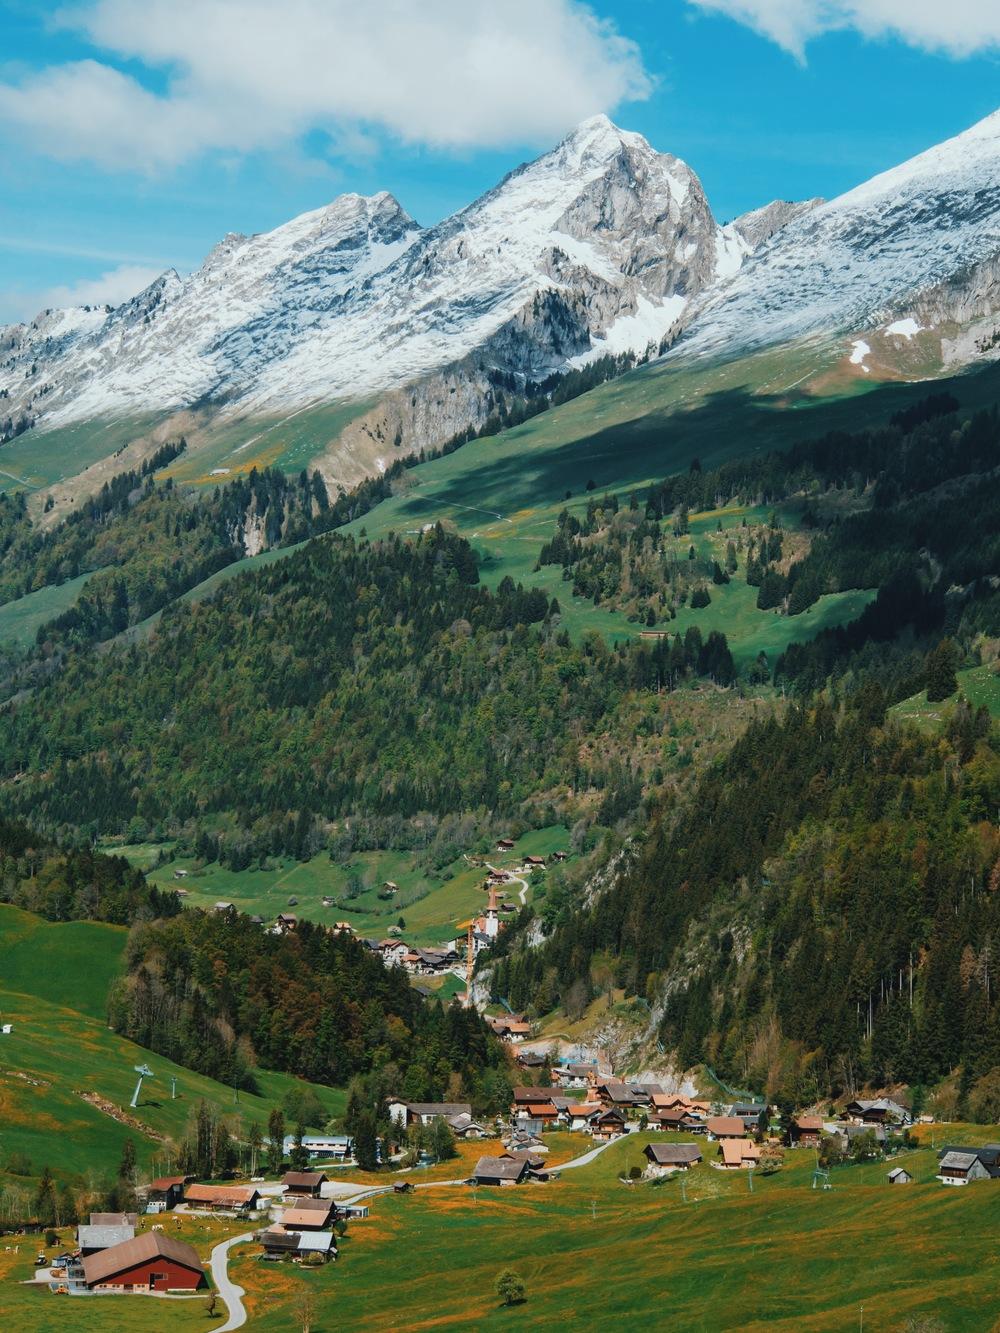 Charmey, Switzerland